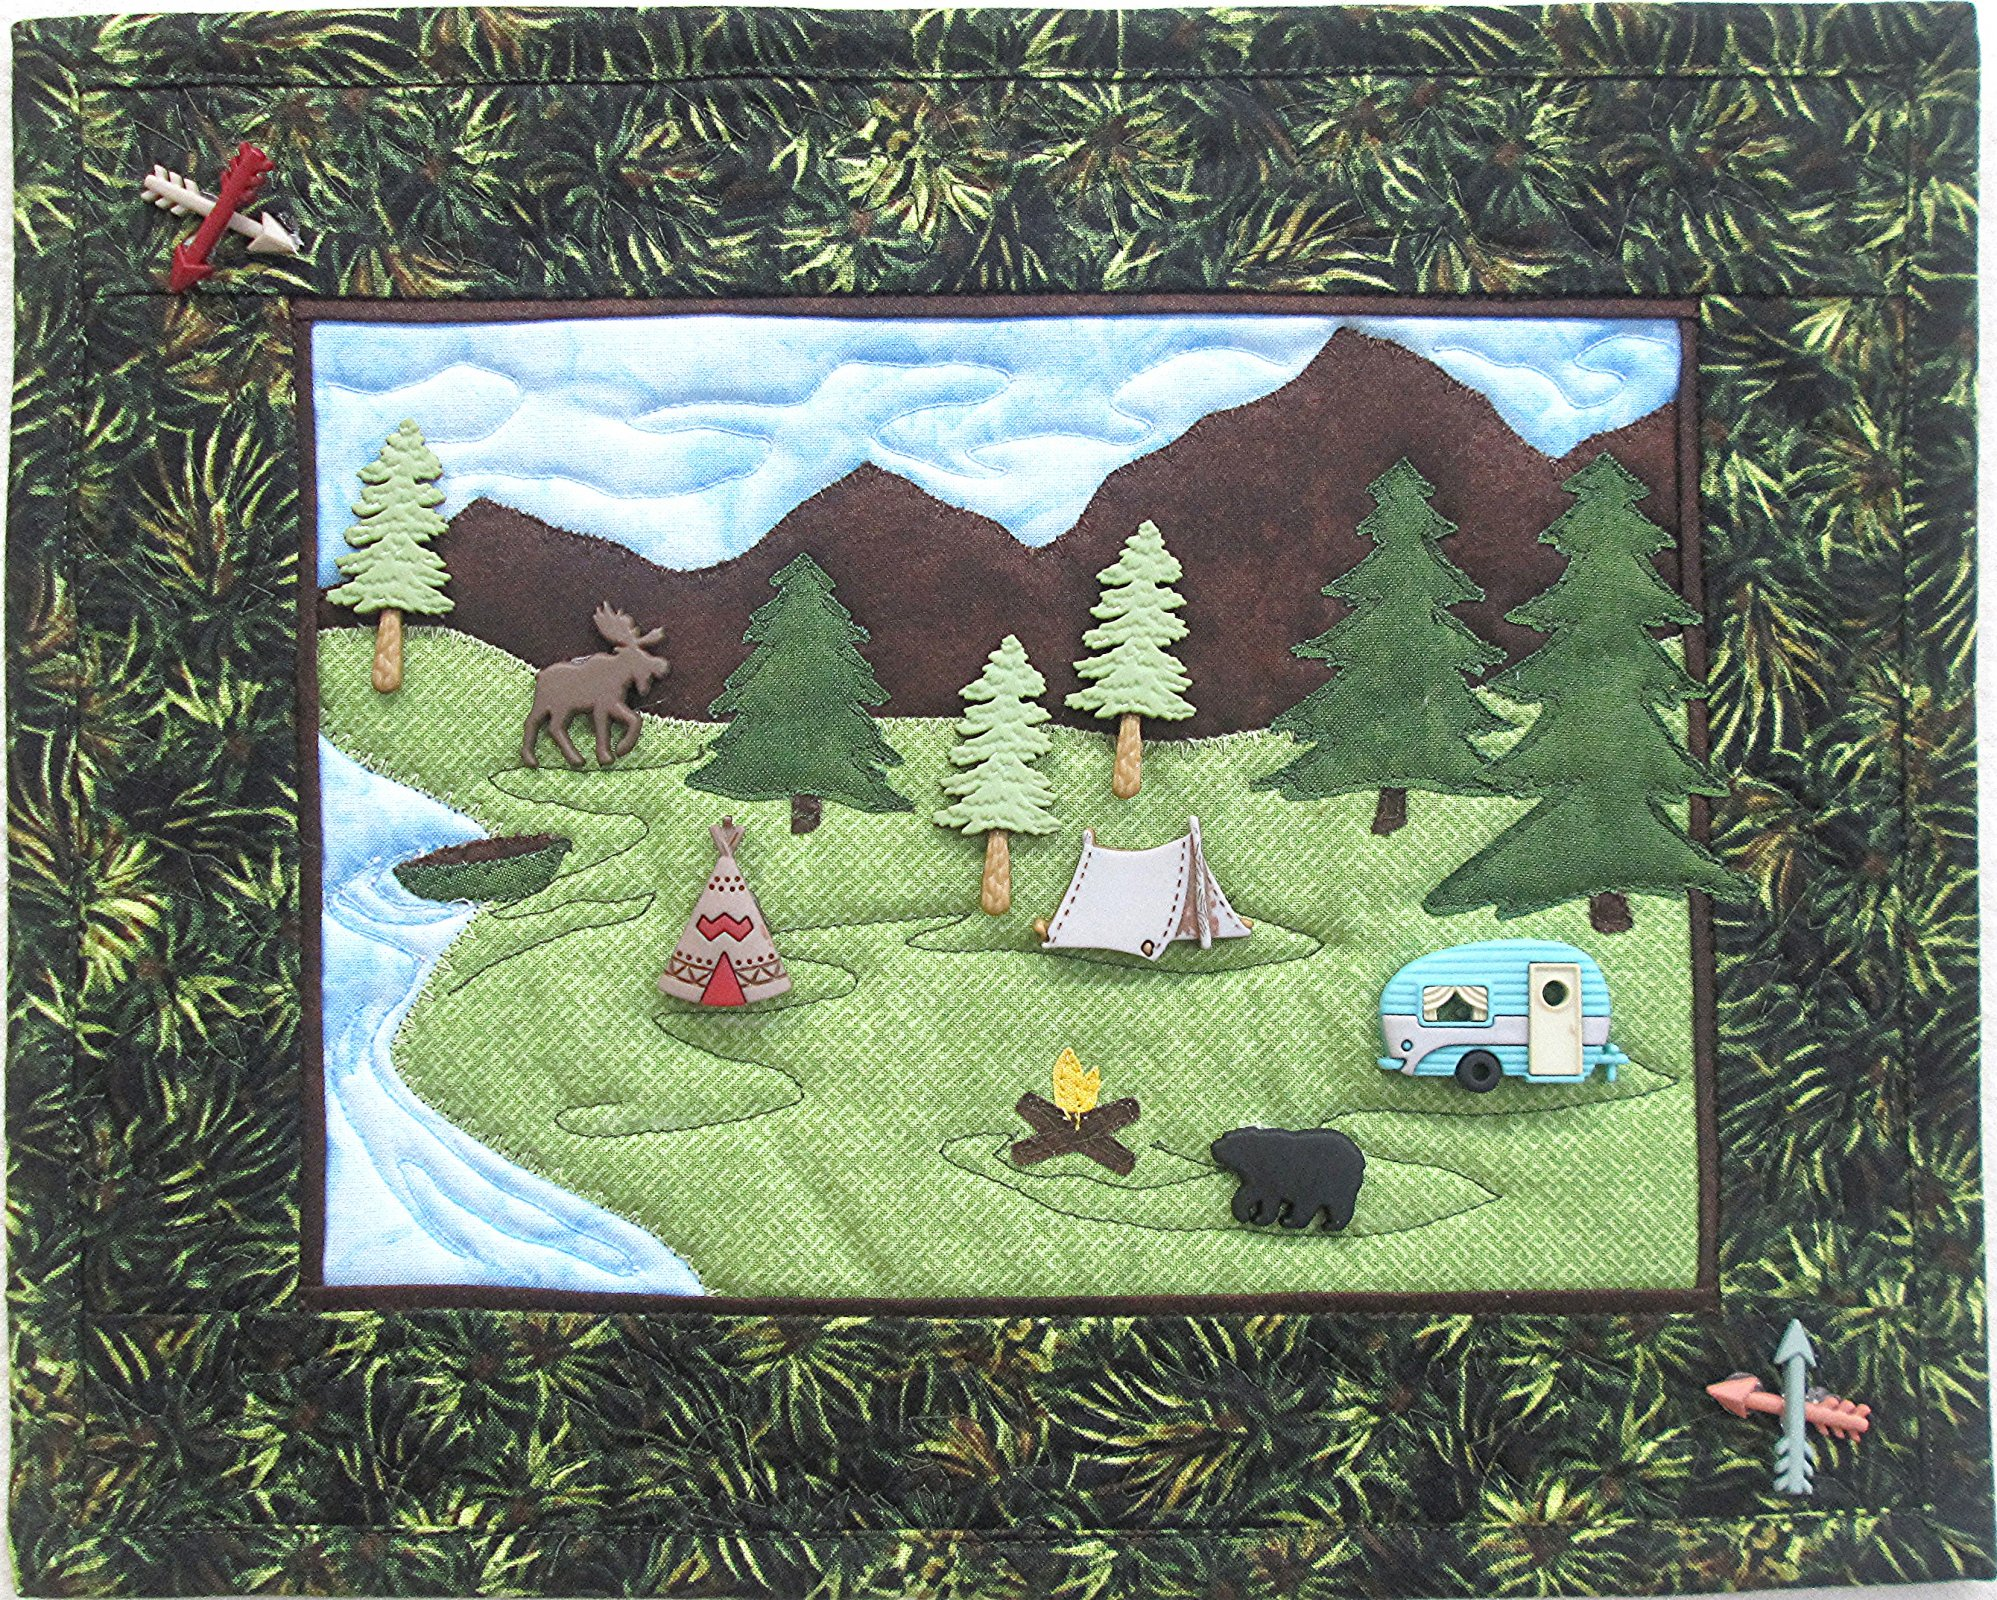 Montana Getaway 2 Wall Hanging Kit 12 1/2 x 10